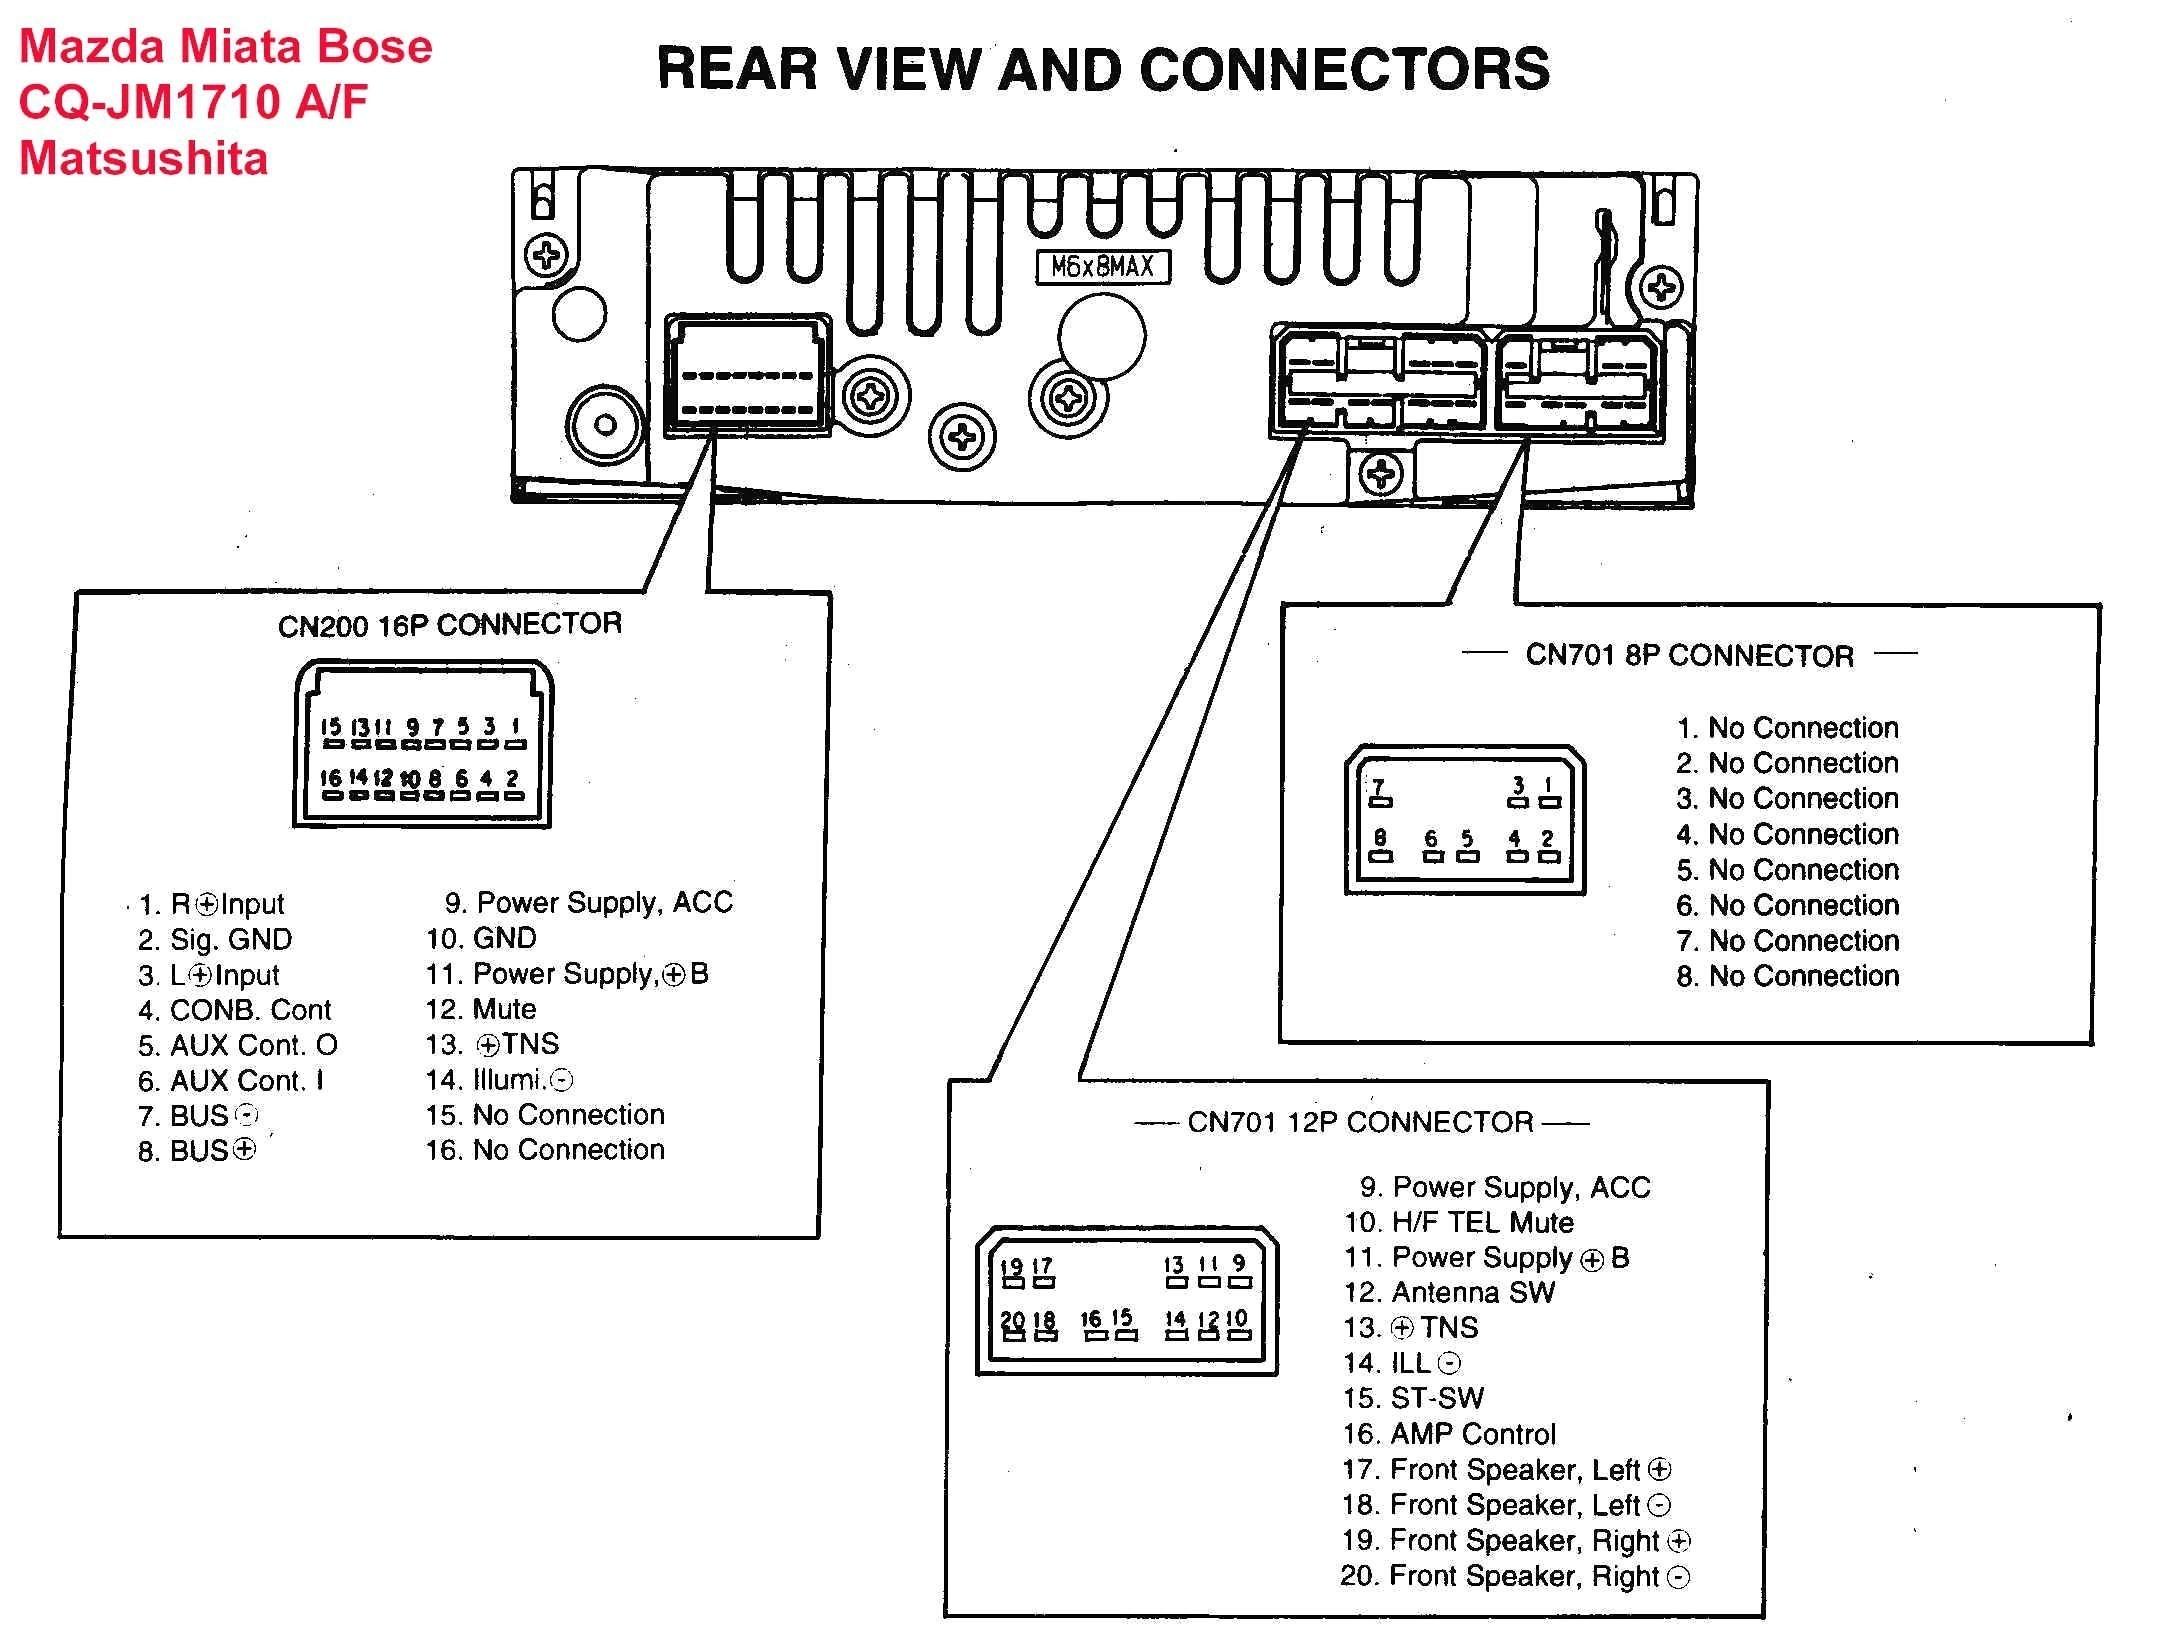 Panasonic Cd Player Wiring Harness - 96 F150 Radio Wiring Diagram for Wiring  Diagram Schematics   Will Burt Detek System Wiring Diagram      Wiring Diagram Schematics